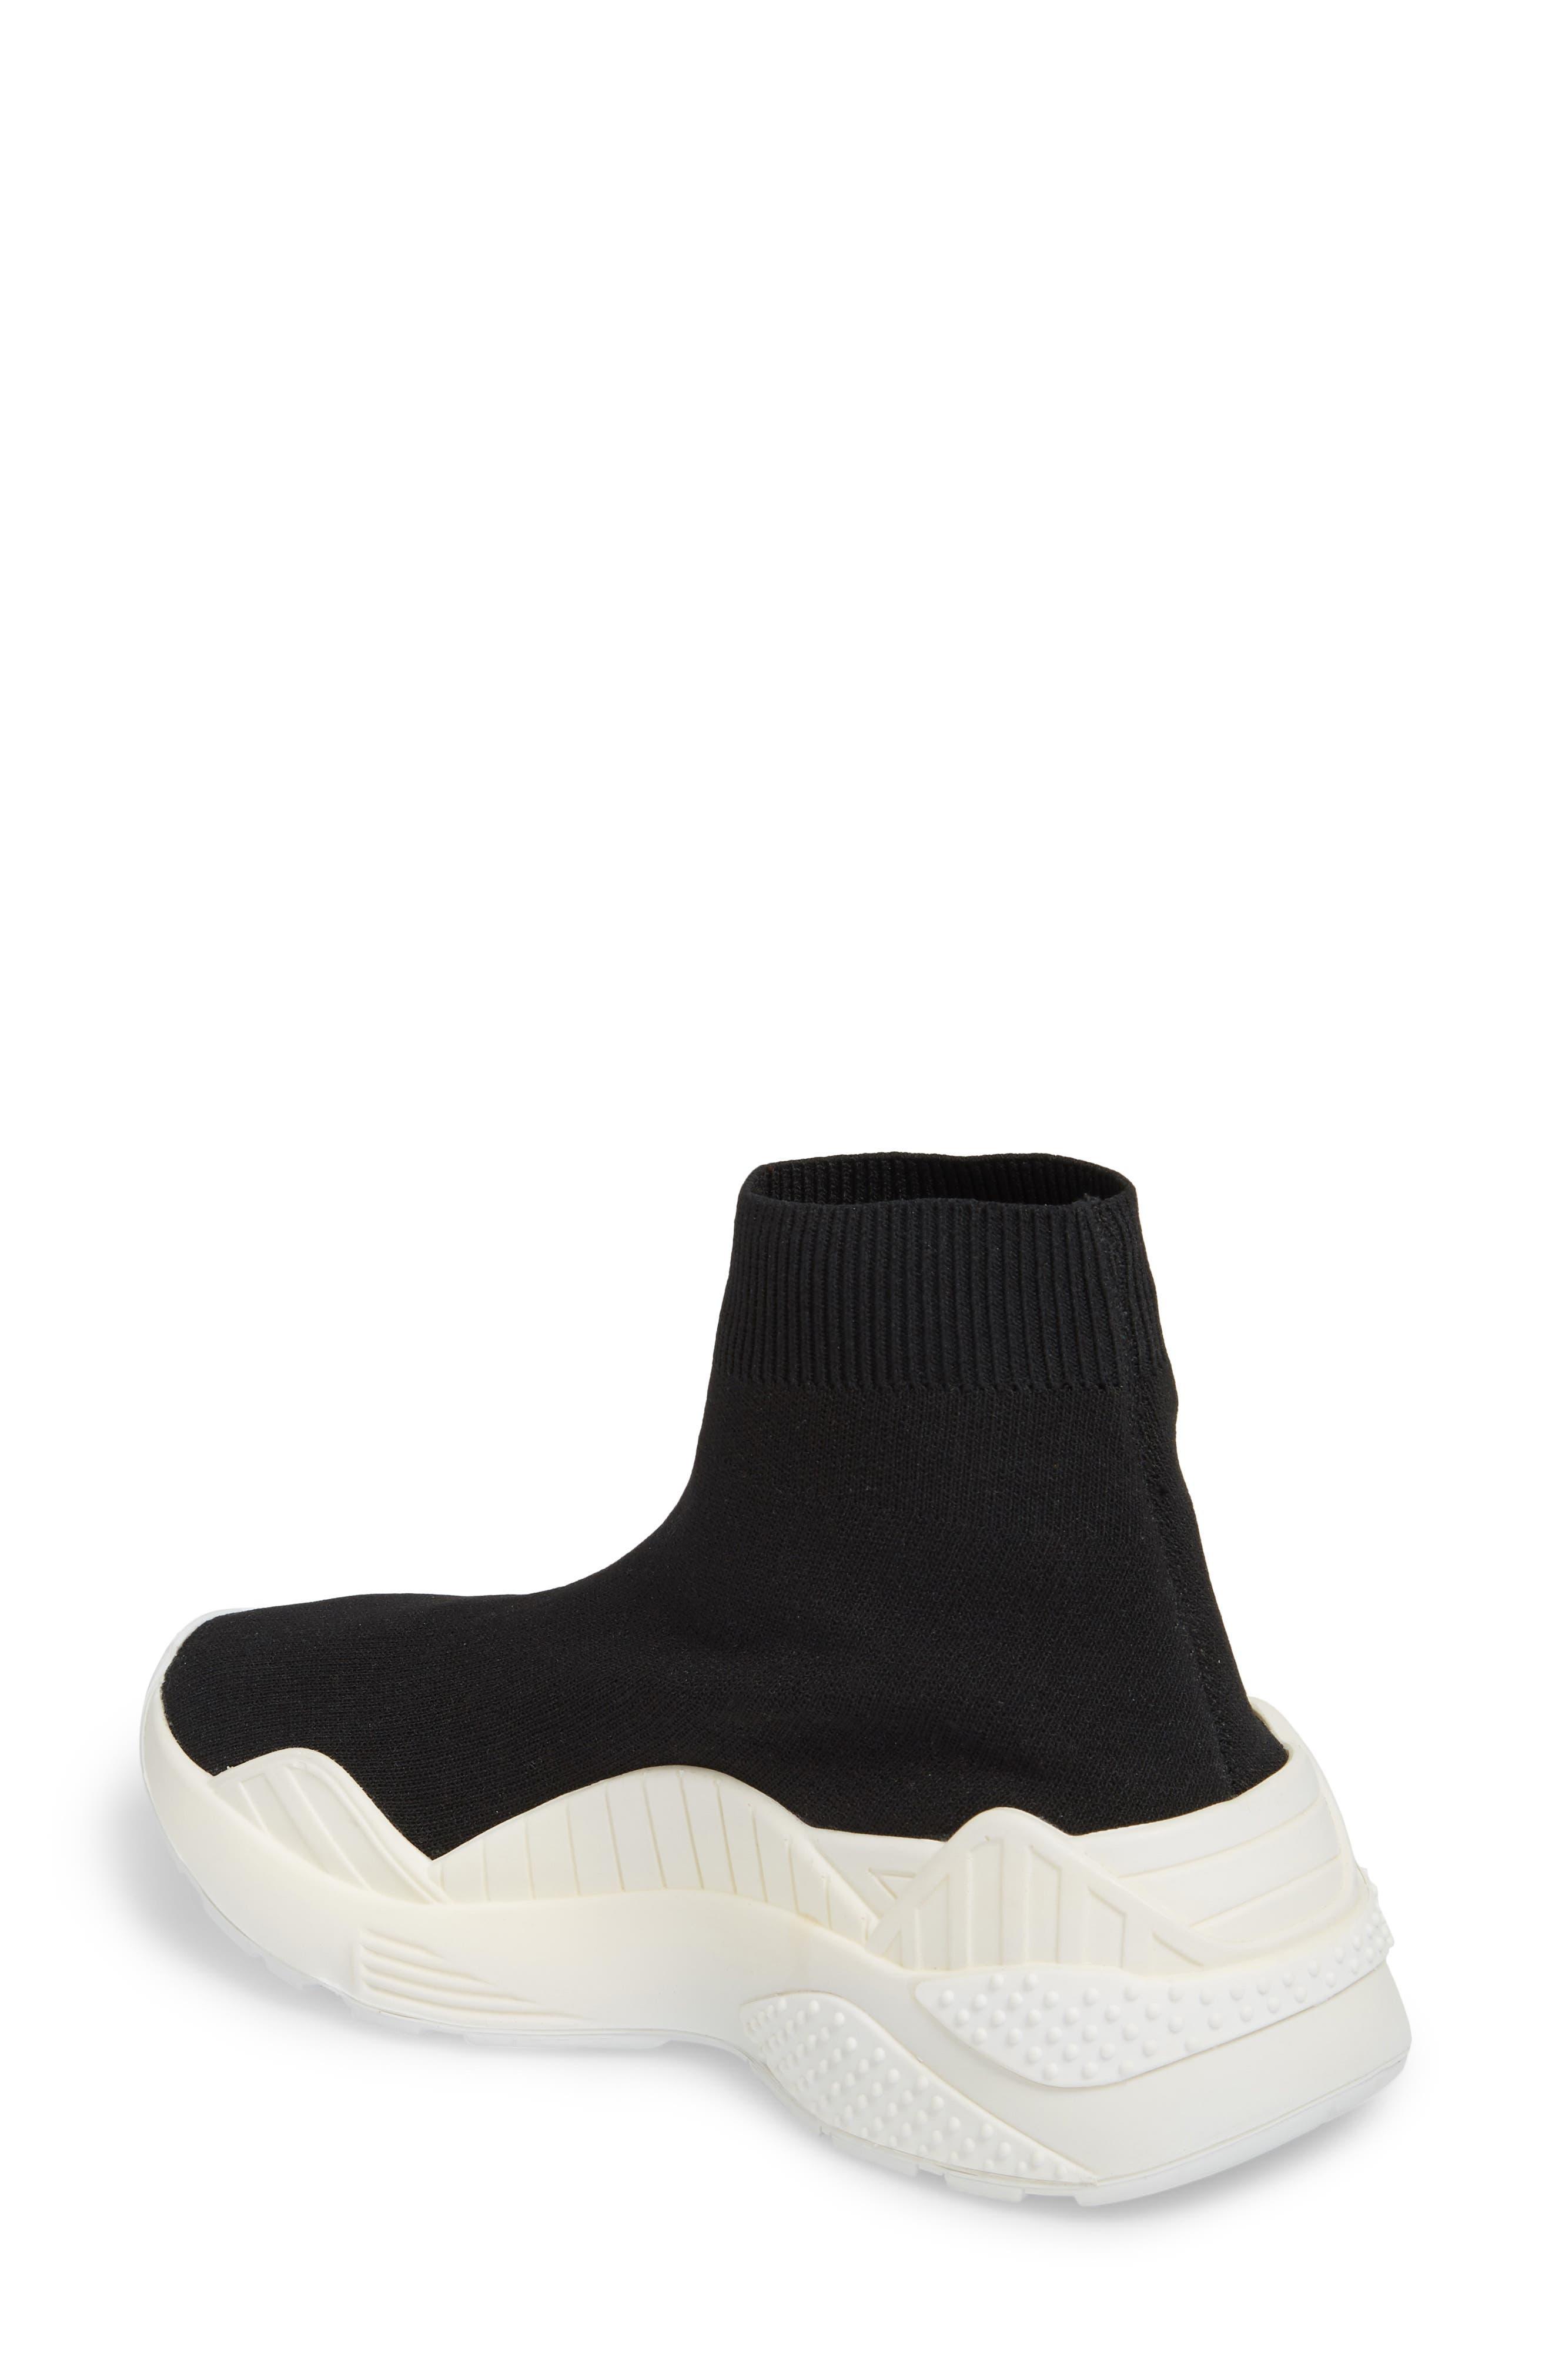 Lunix Sock Sneaker,                             Alternate thumbnail 2, color,                             Black/ White Leather